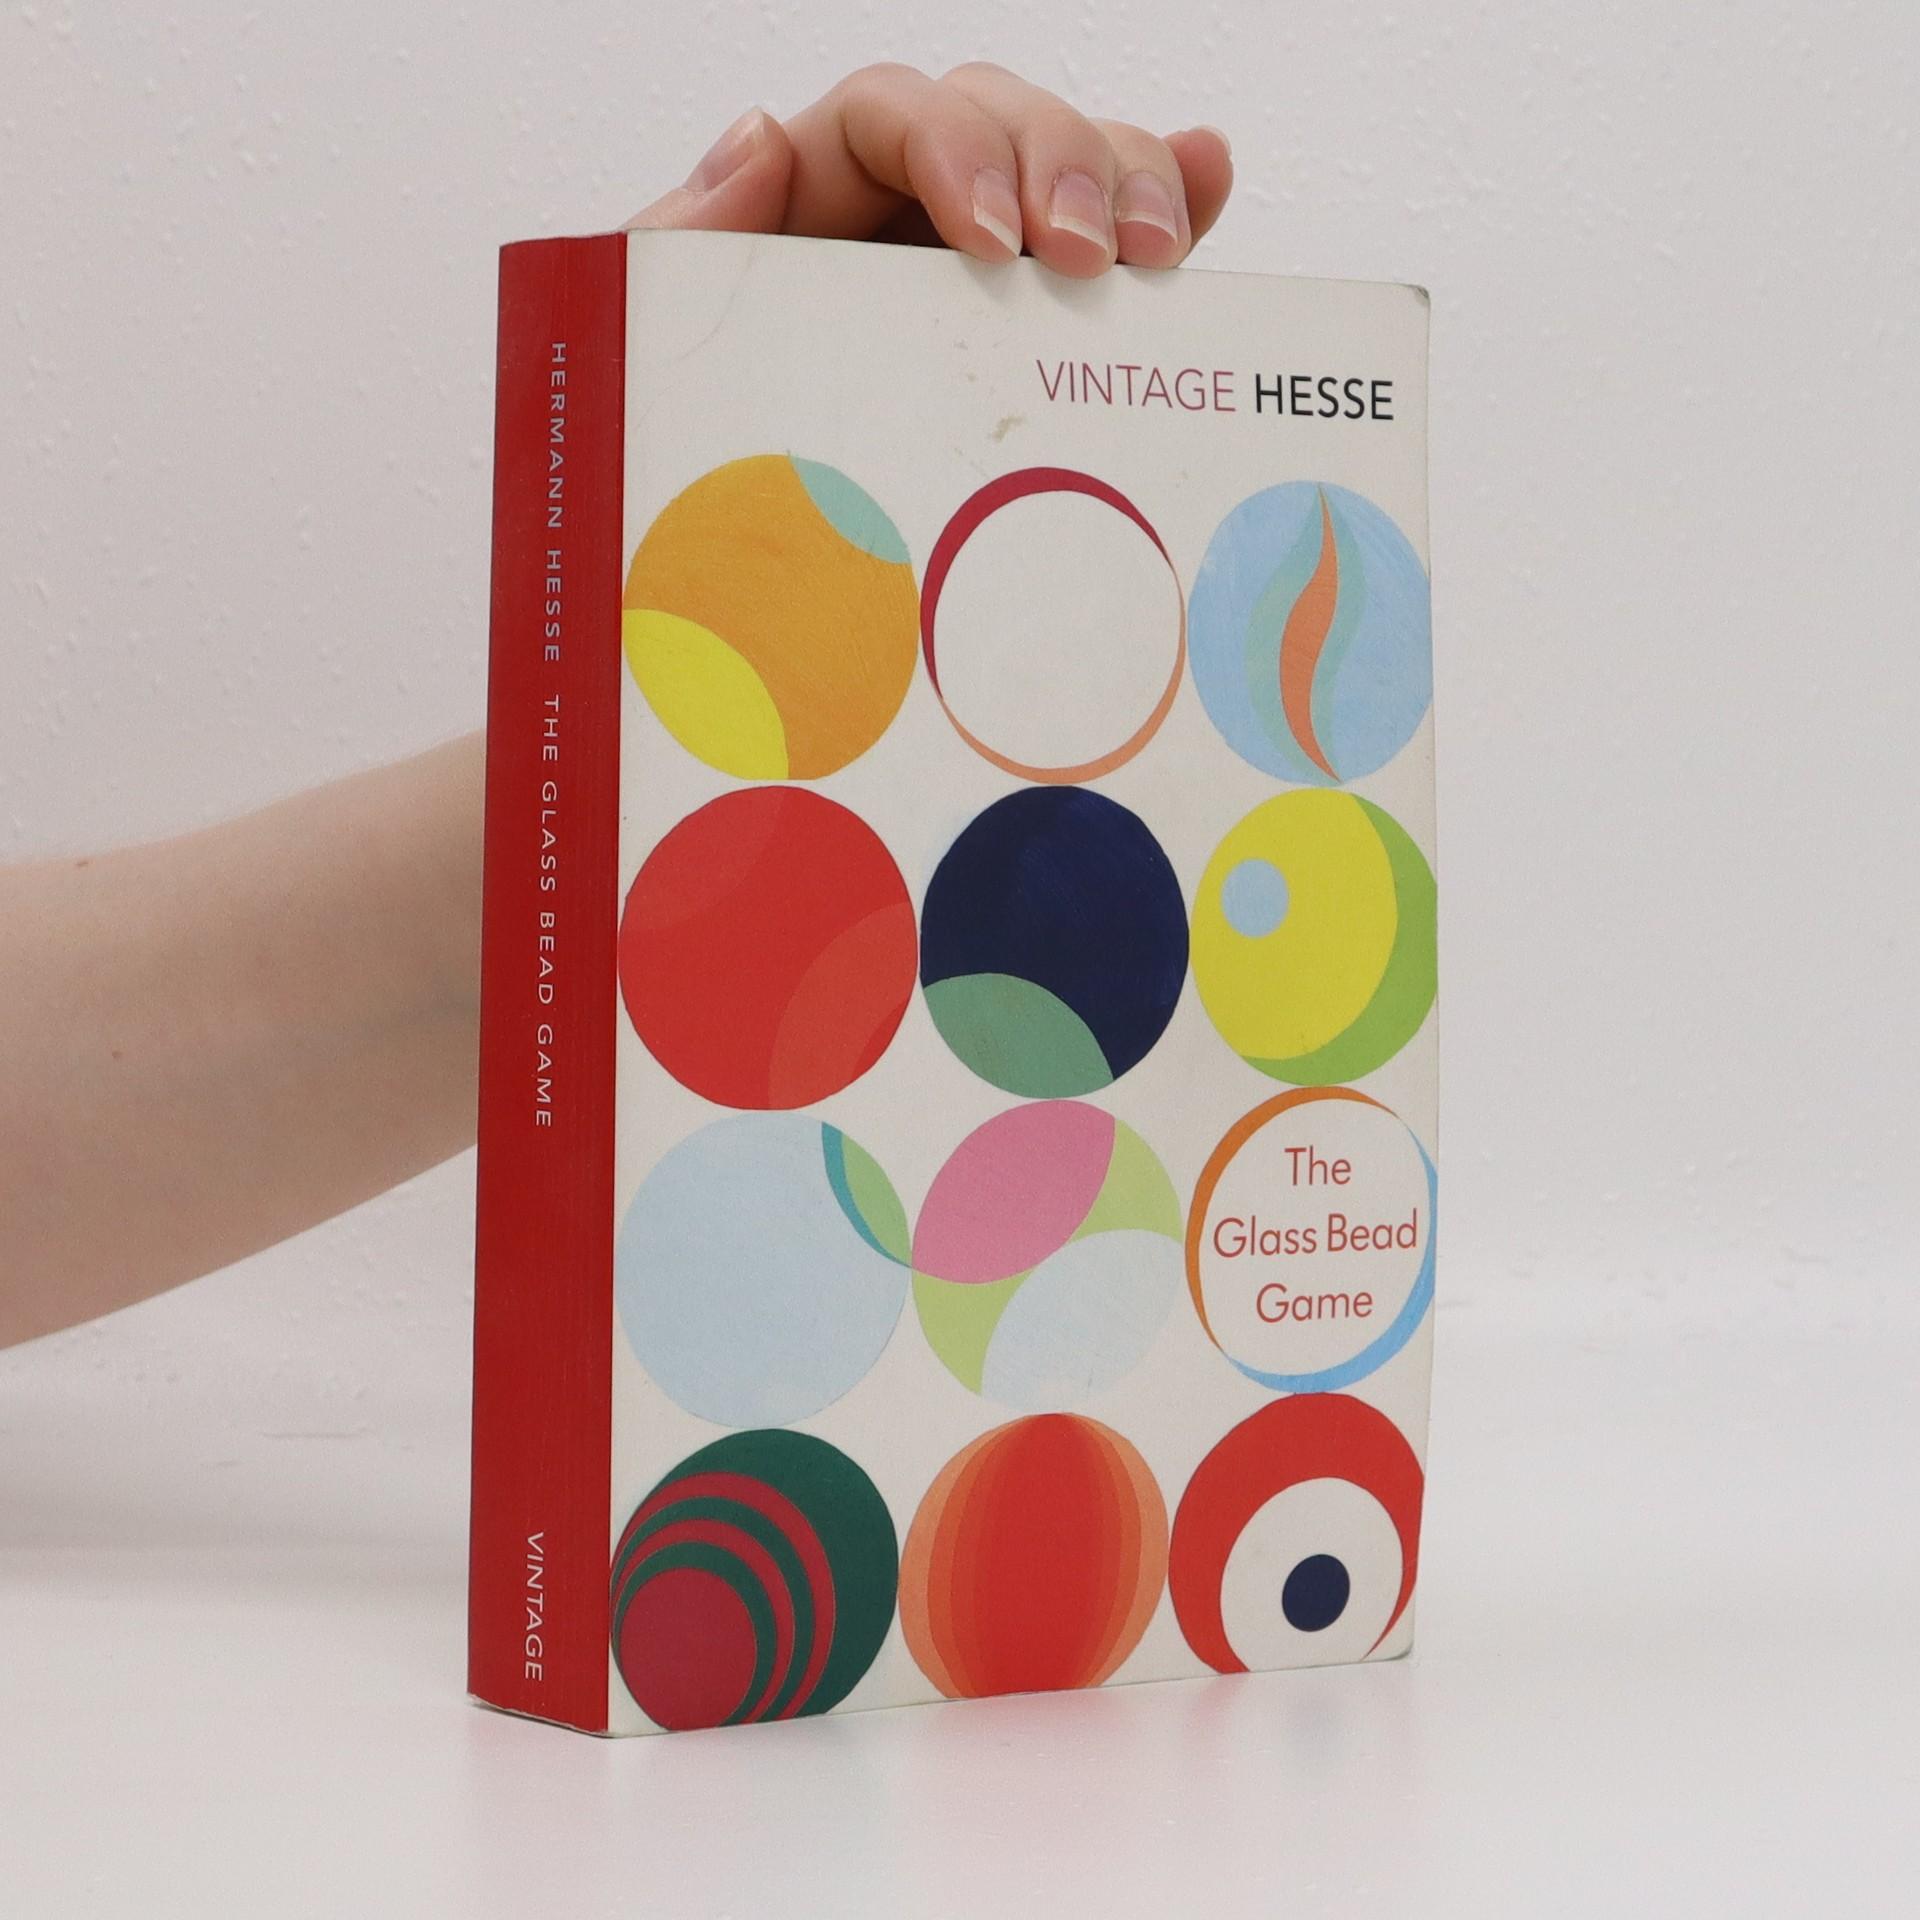 antikvární kniha The Glass Bead Game, 2000